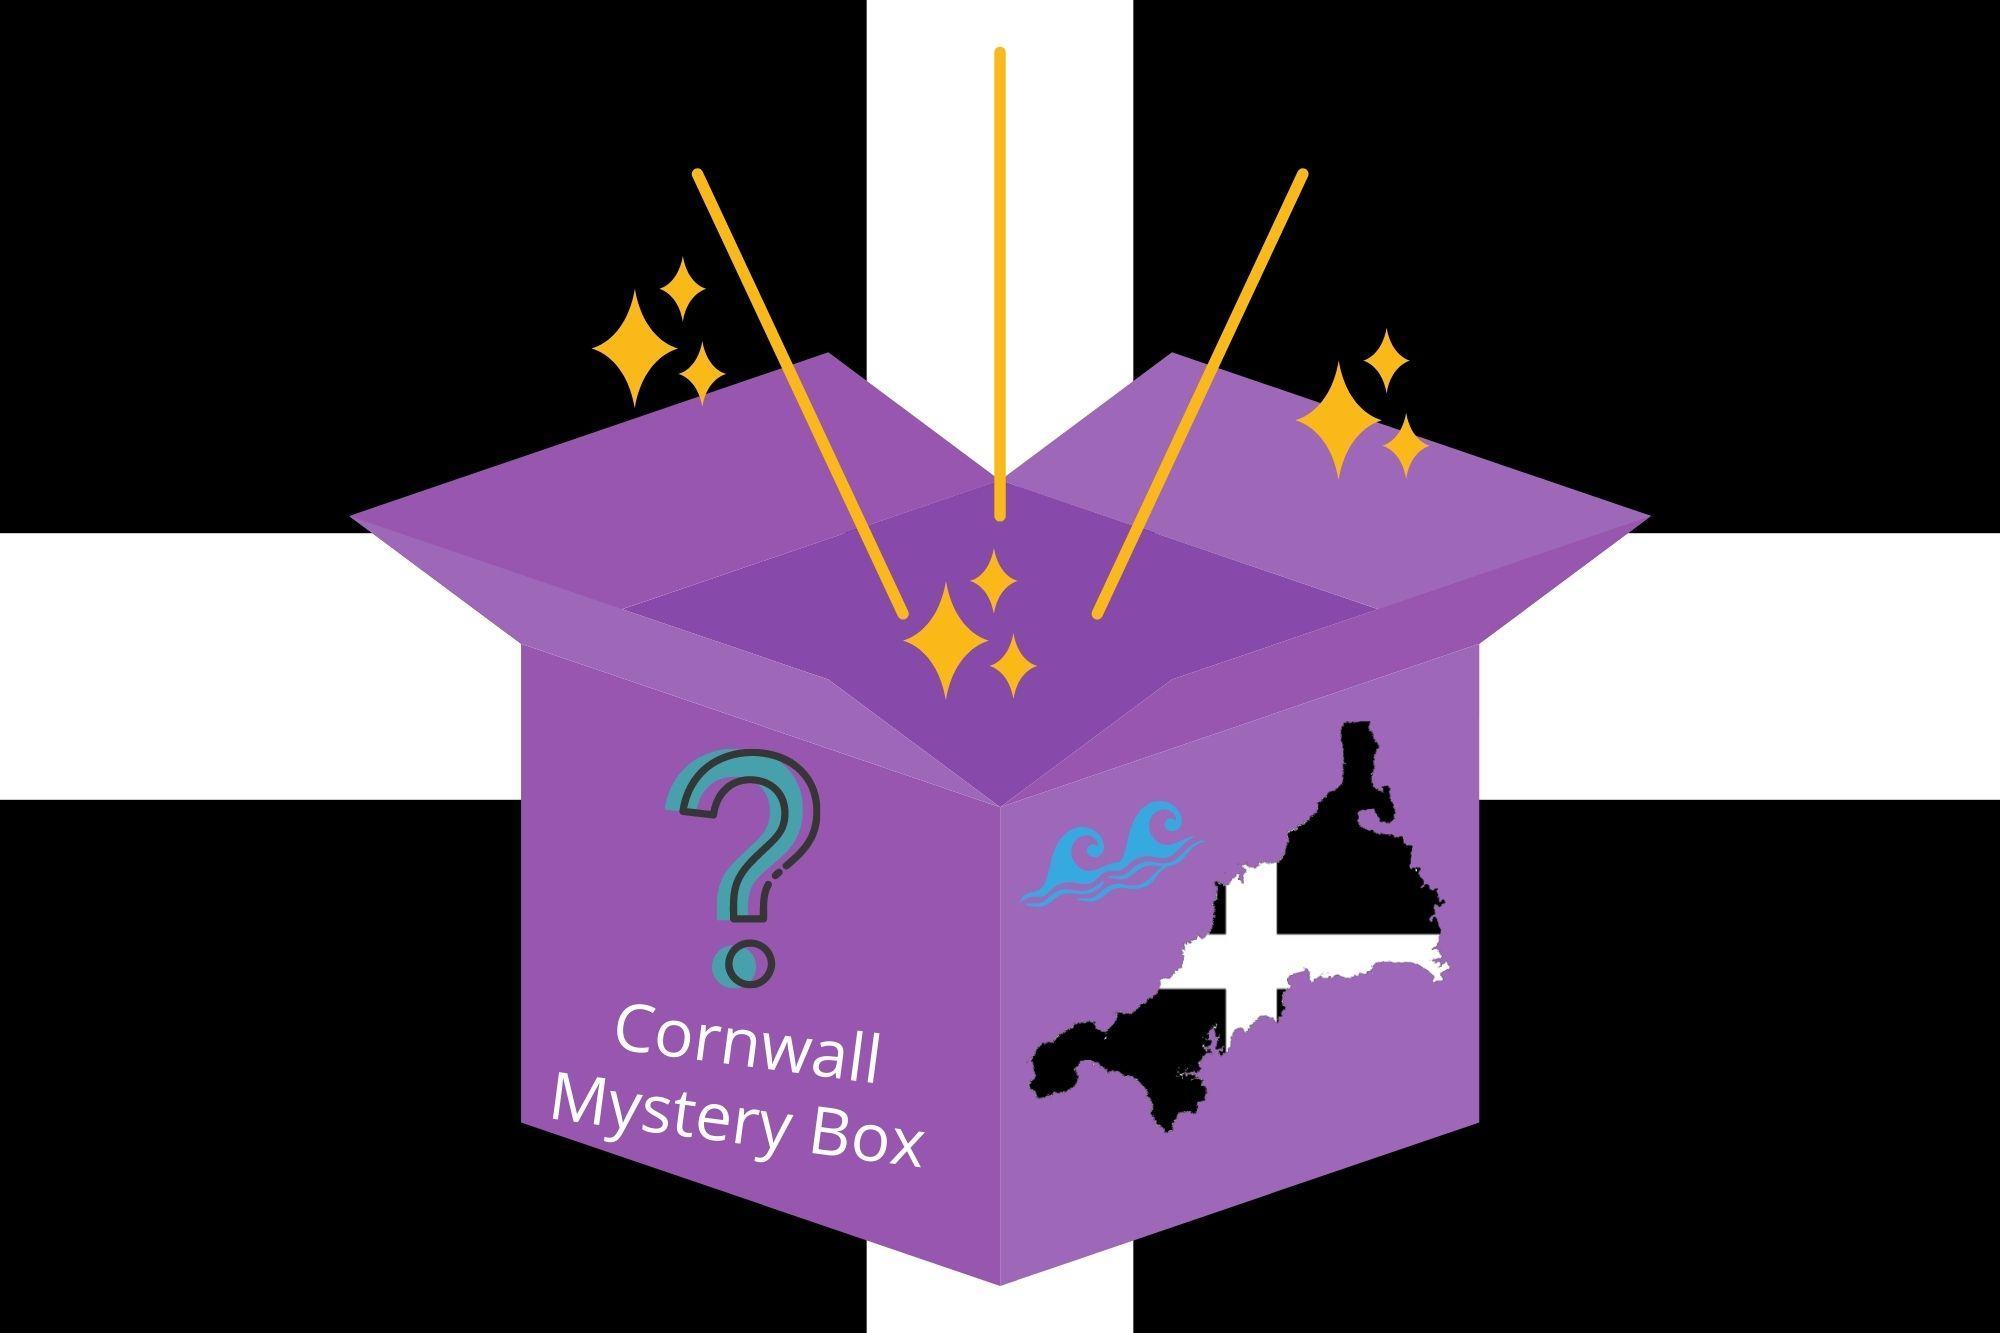 Cornwall Mystery Box